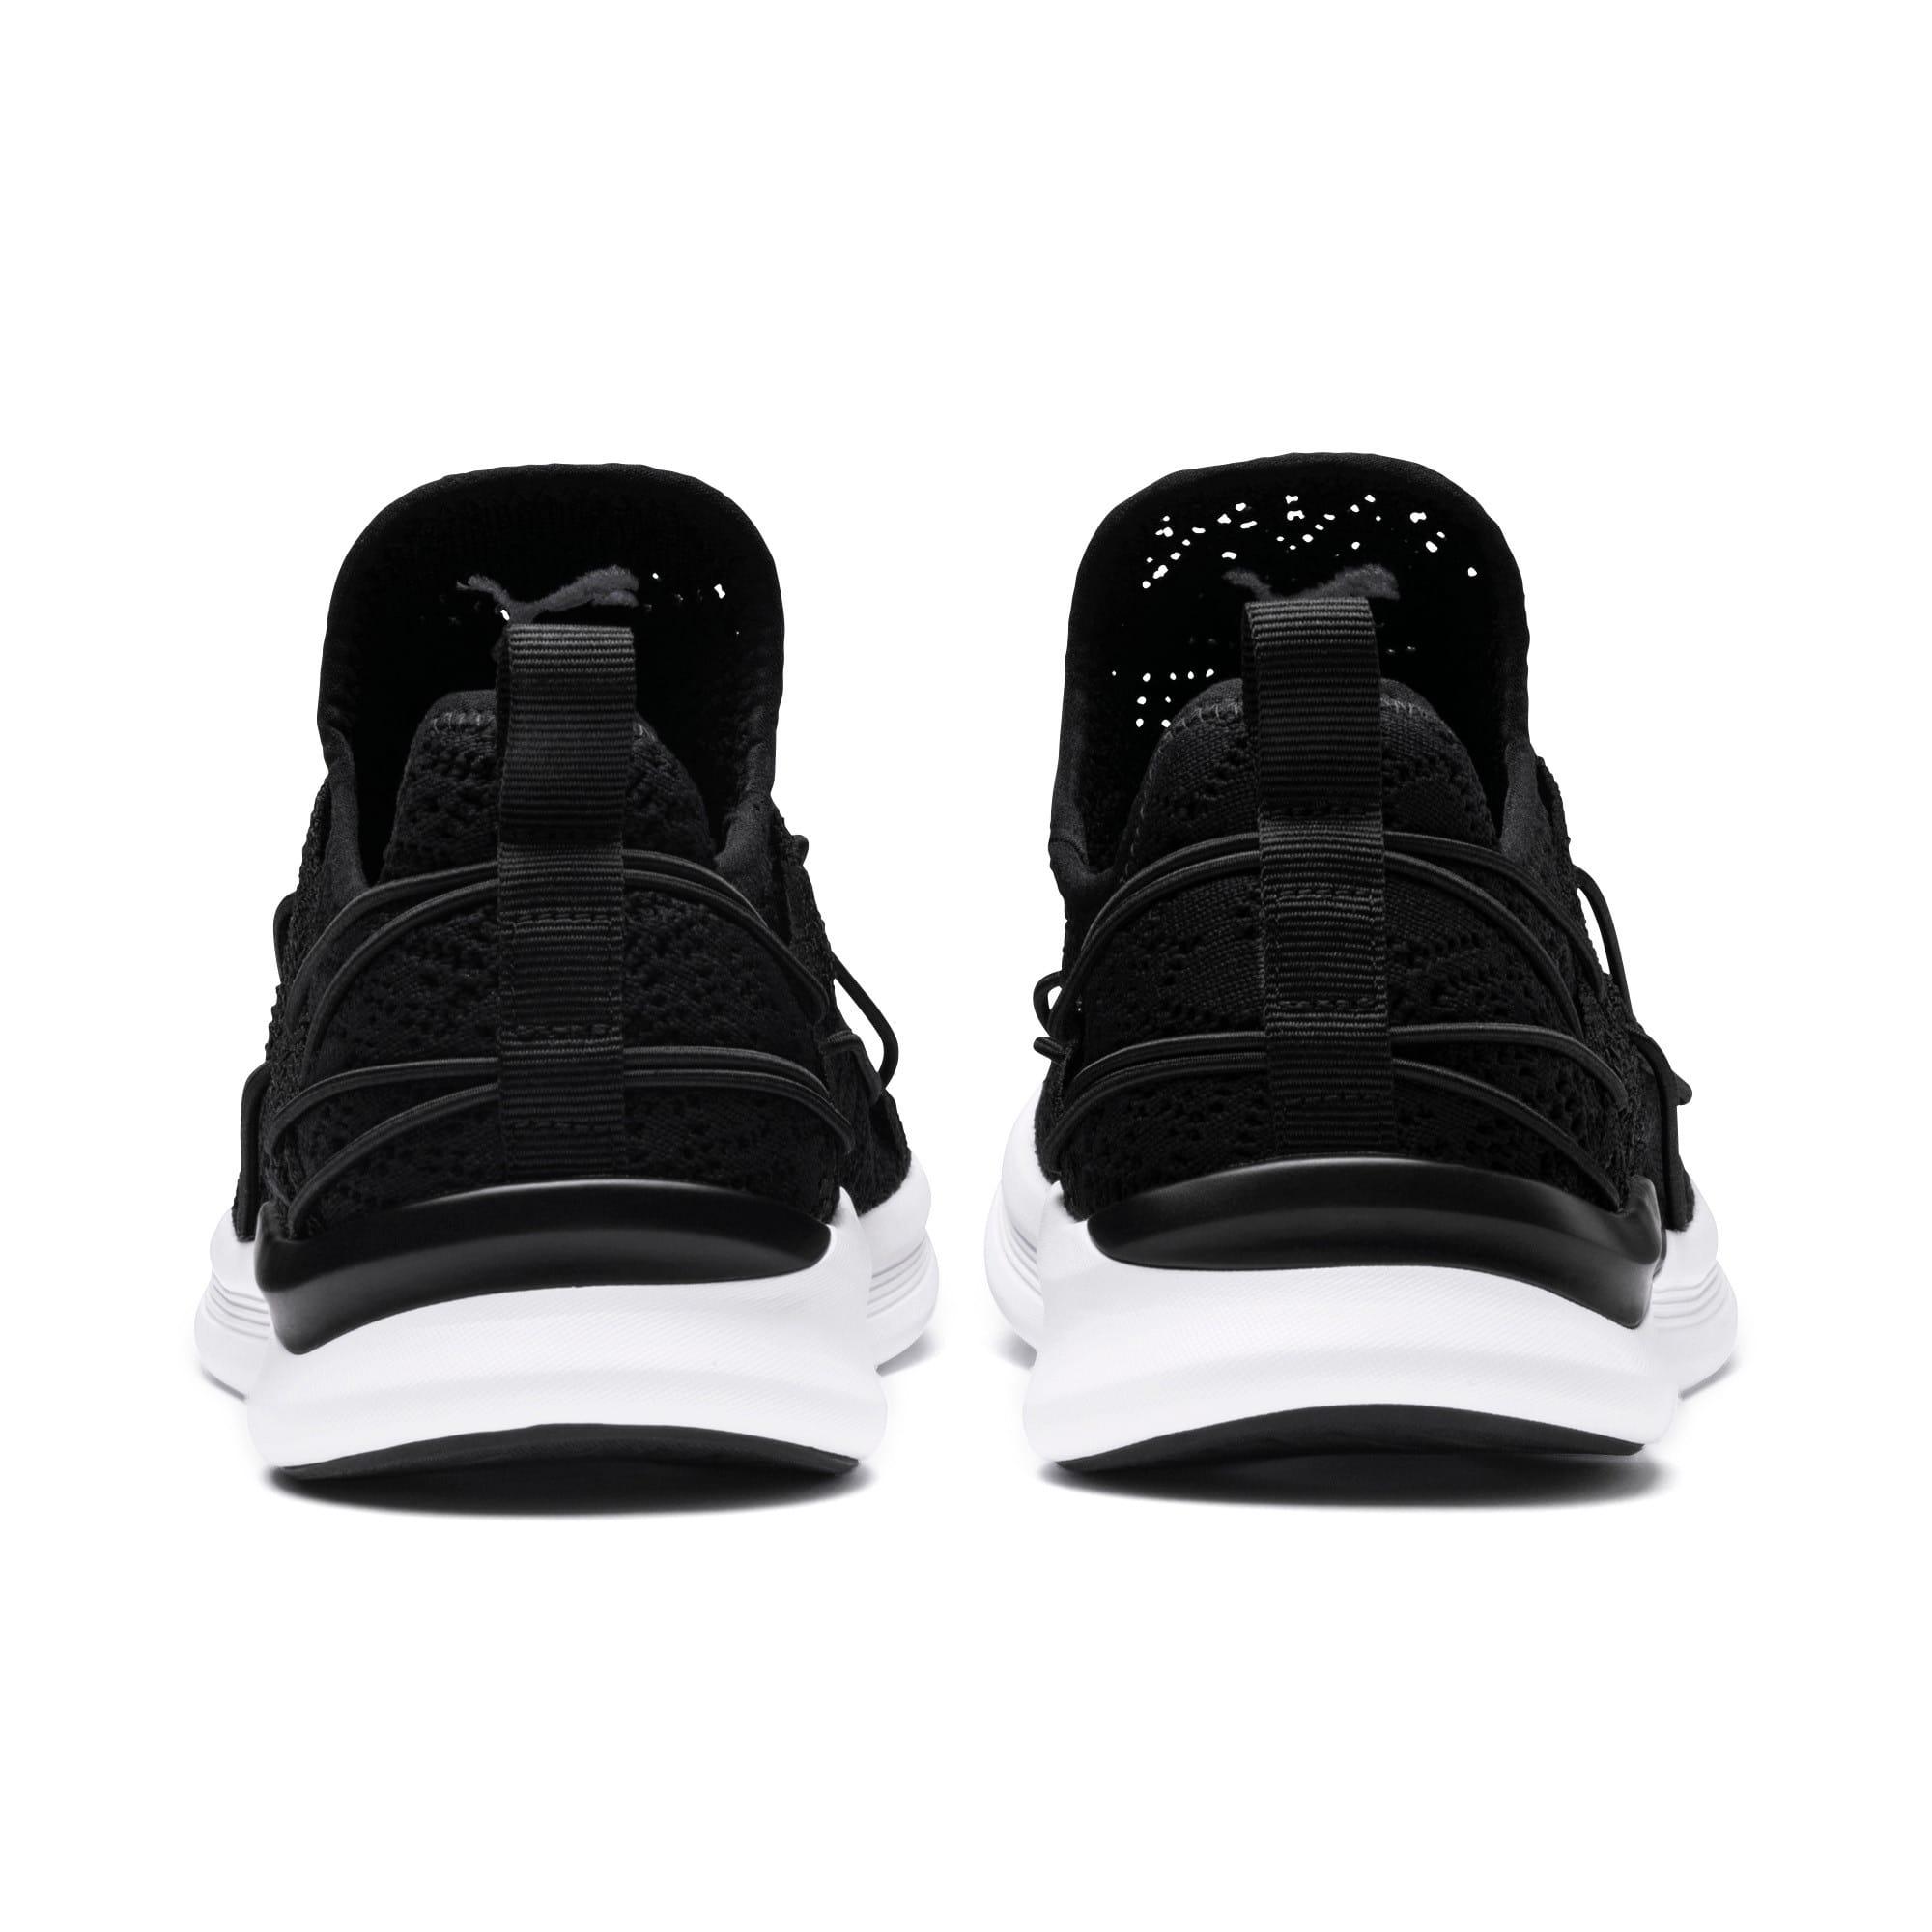 Thumbnail 4 of IGNITE Flash Sensua Women's Running Shoes, Puma Black-Puma White, medium